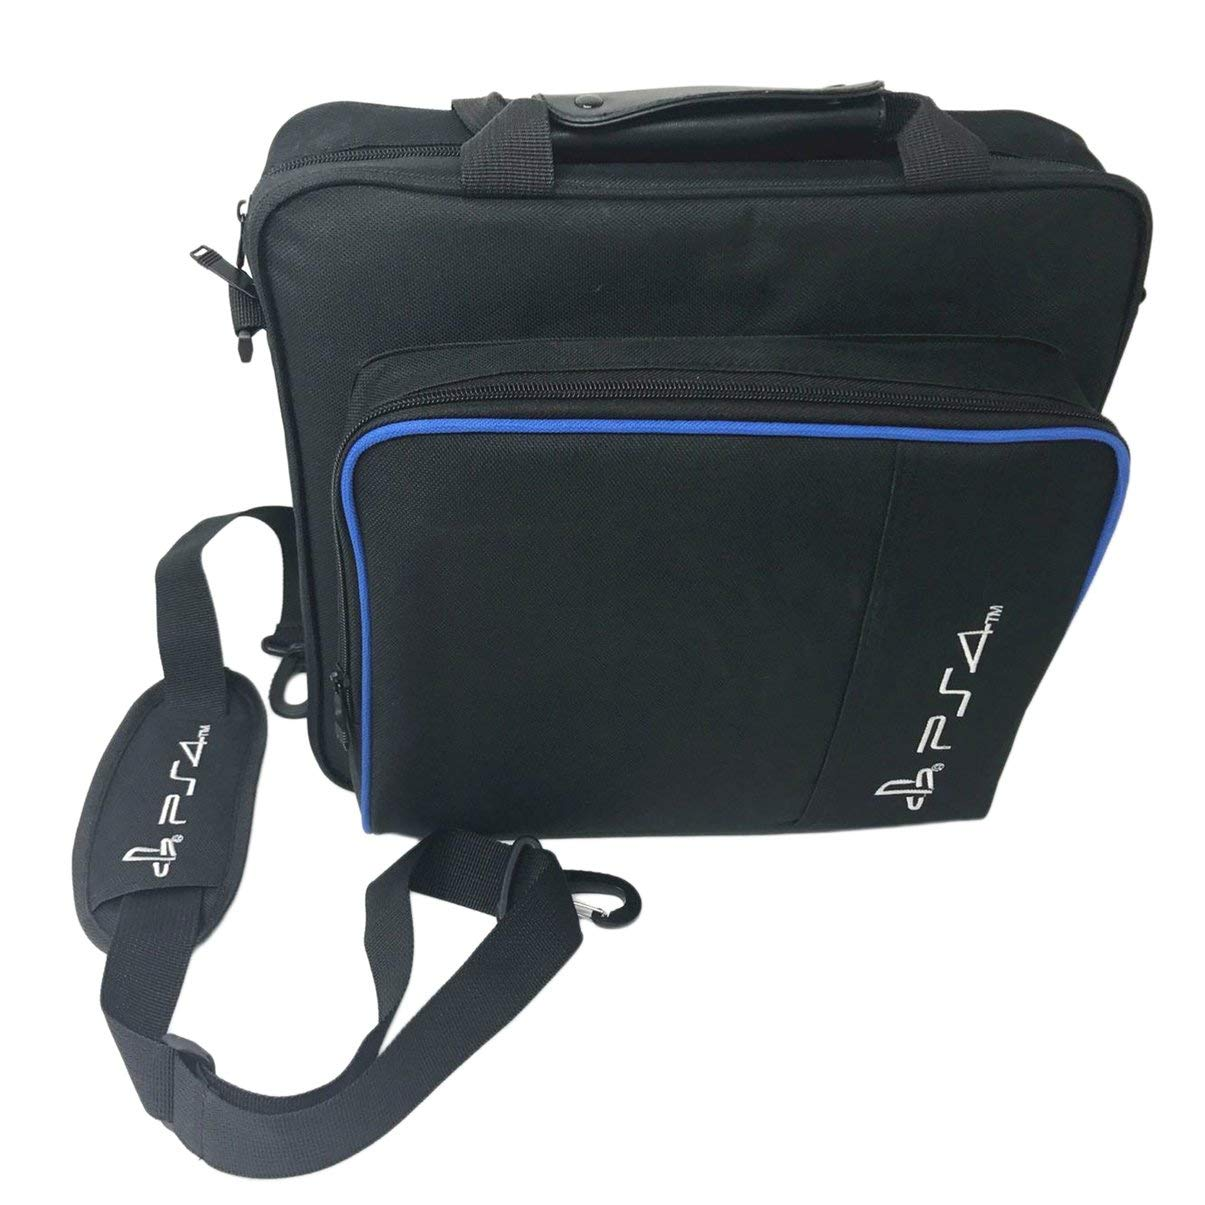 Game Console Bolsa de almacenamiento a prueba de golpes Bolsa de viaje impermeable Bolsa de hombro para PS4 Pro Accesorios de la consola Carry Bag JullyeleESgant